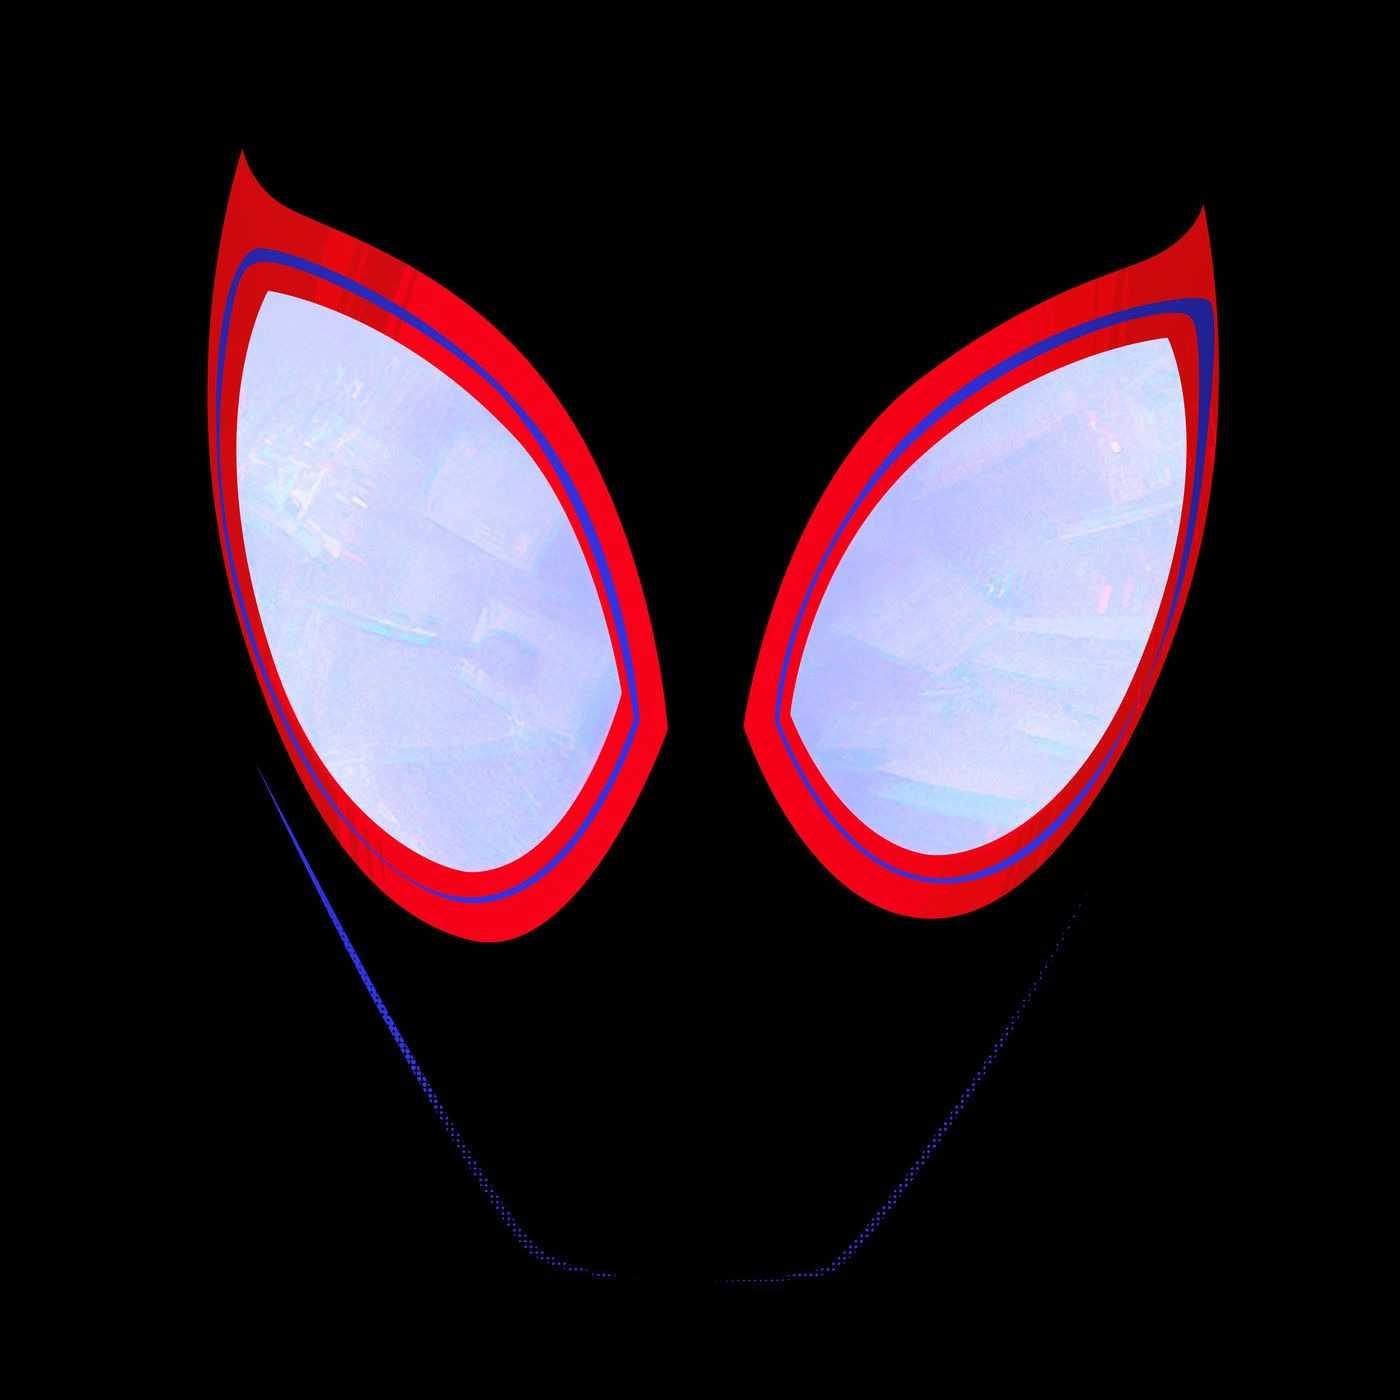 New Single: Nicki Minaj & Anuel AA | Familia (feat. Bantu) [Spider-Man: Into the Spider-Verse] [Audio]